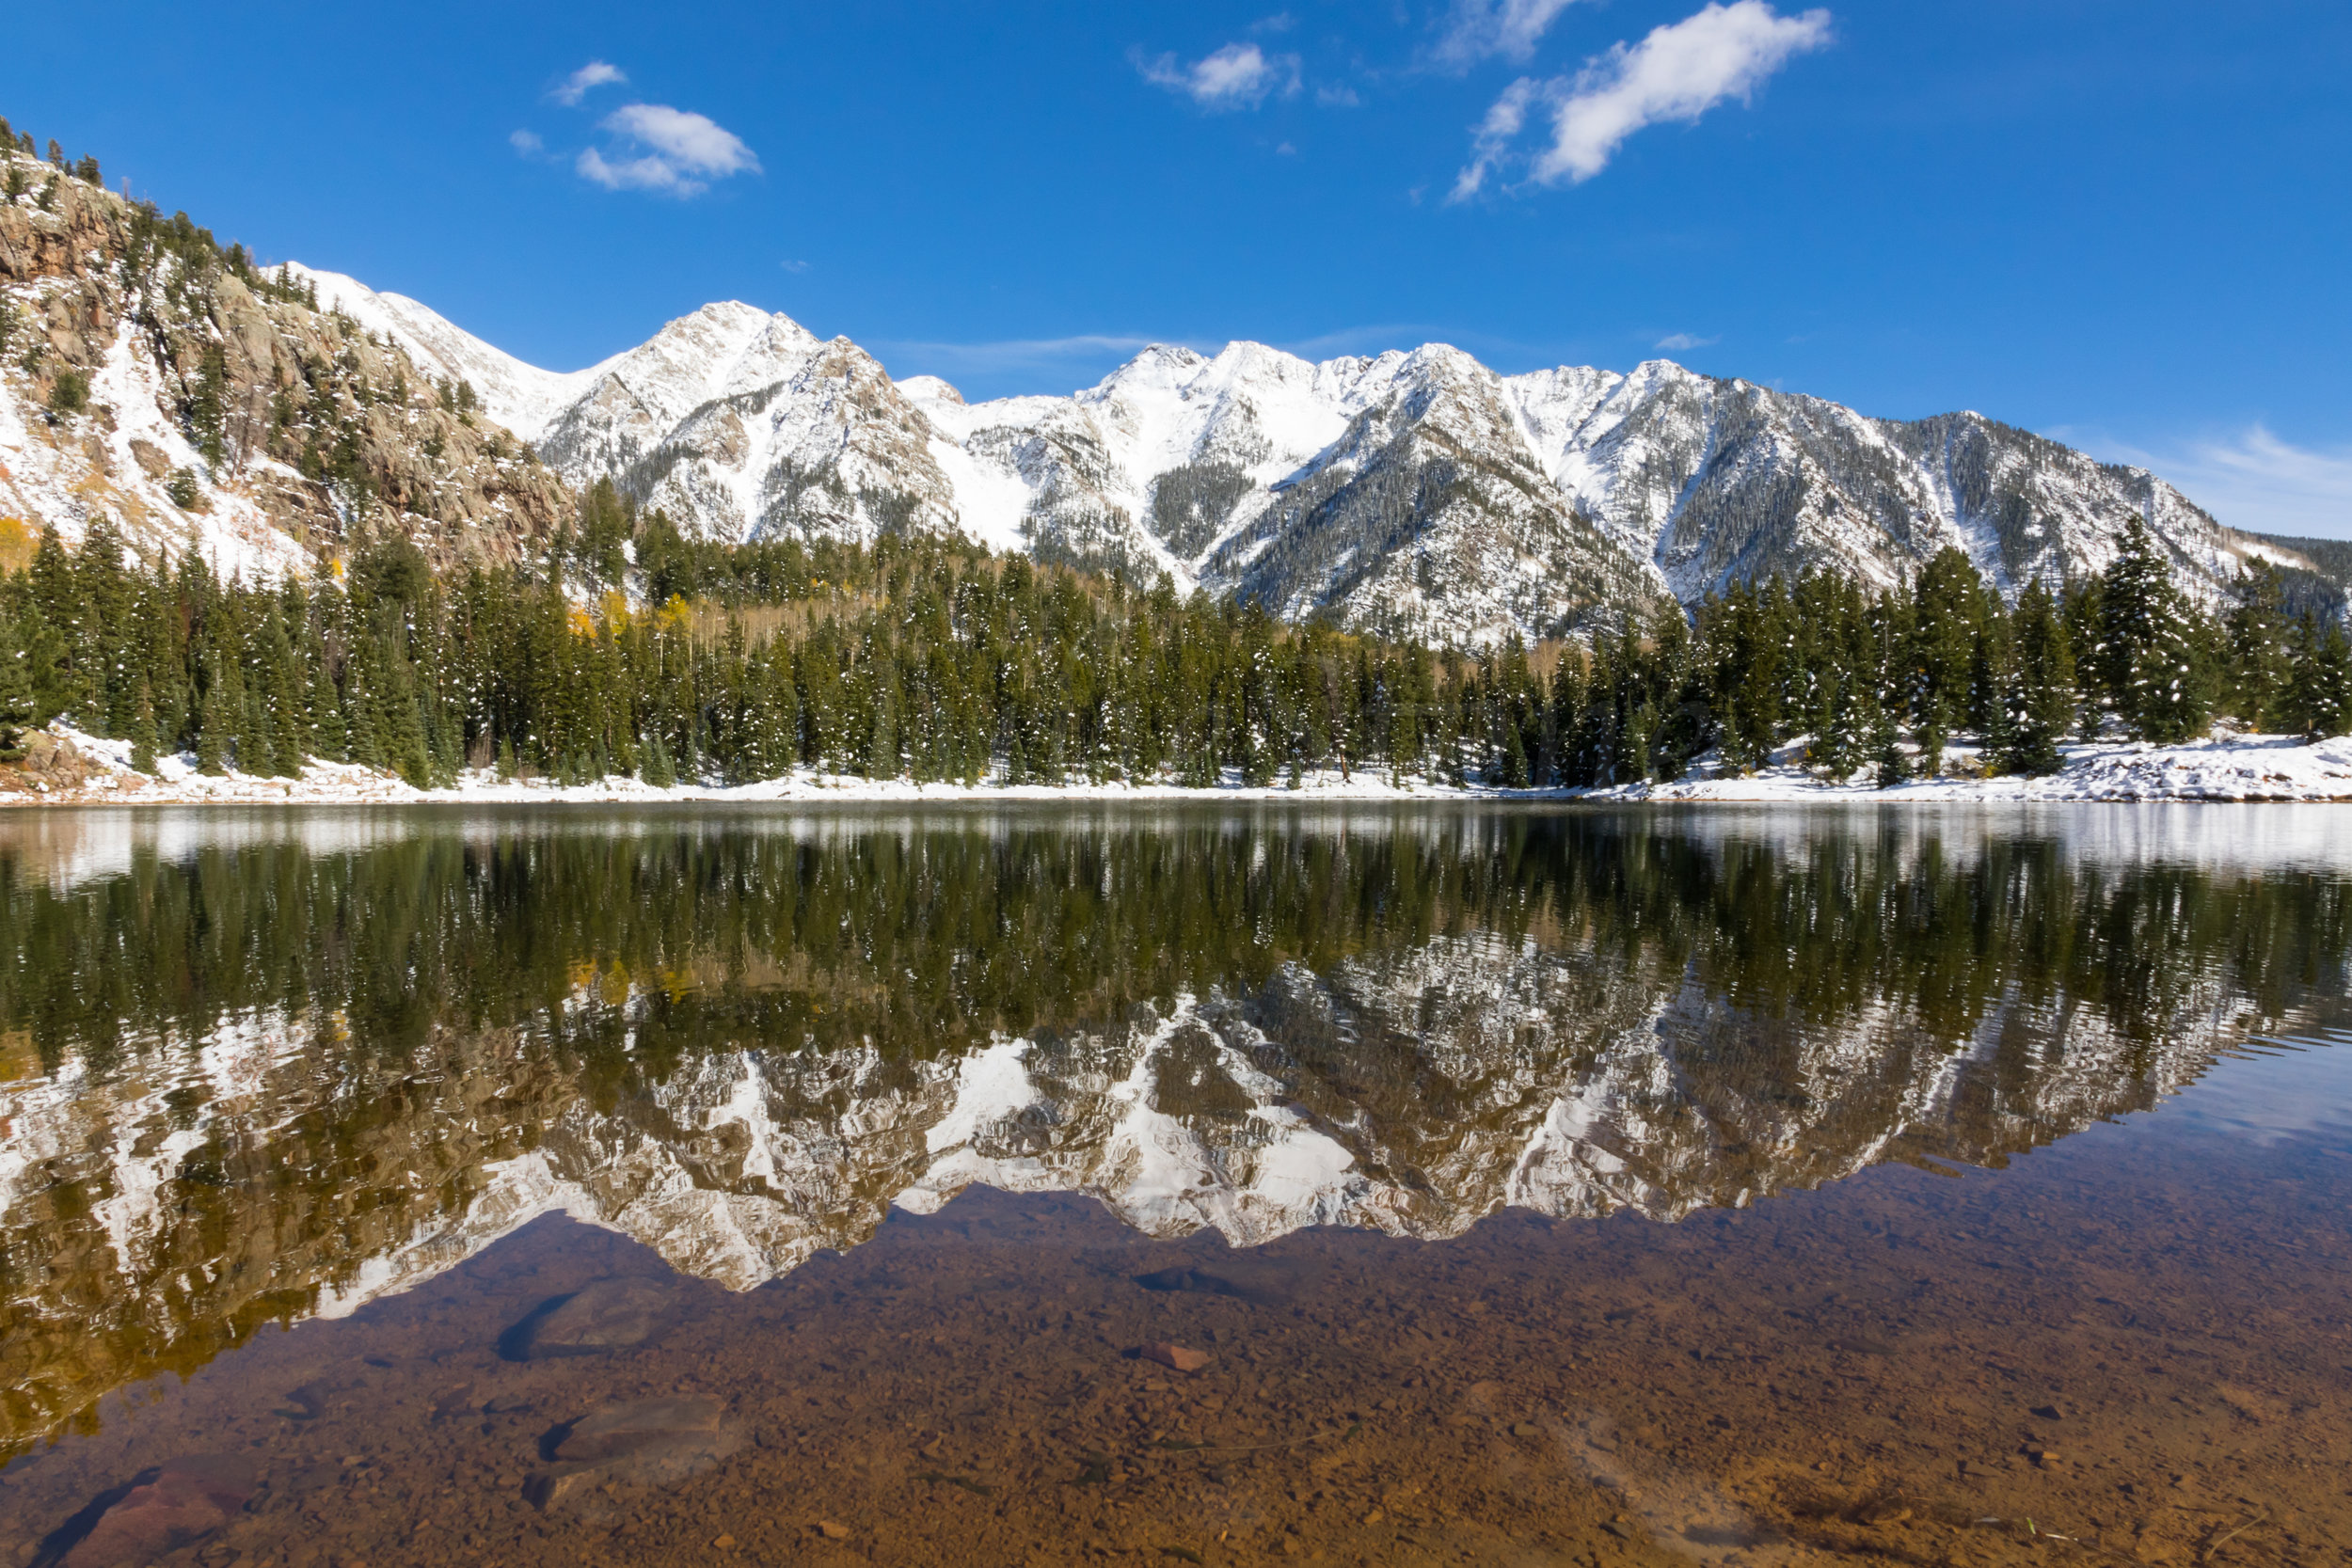 Spud Lake, Image # 1041